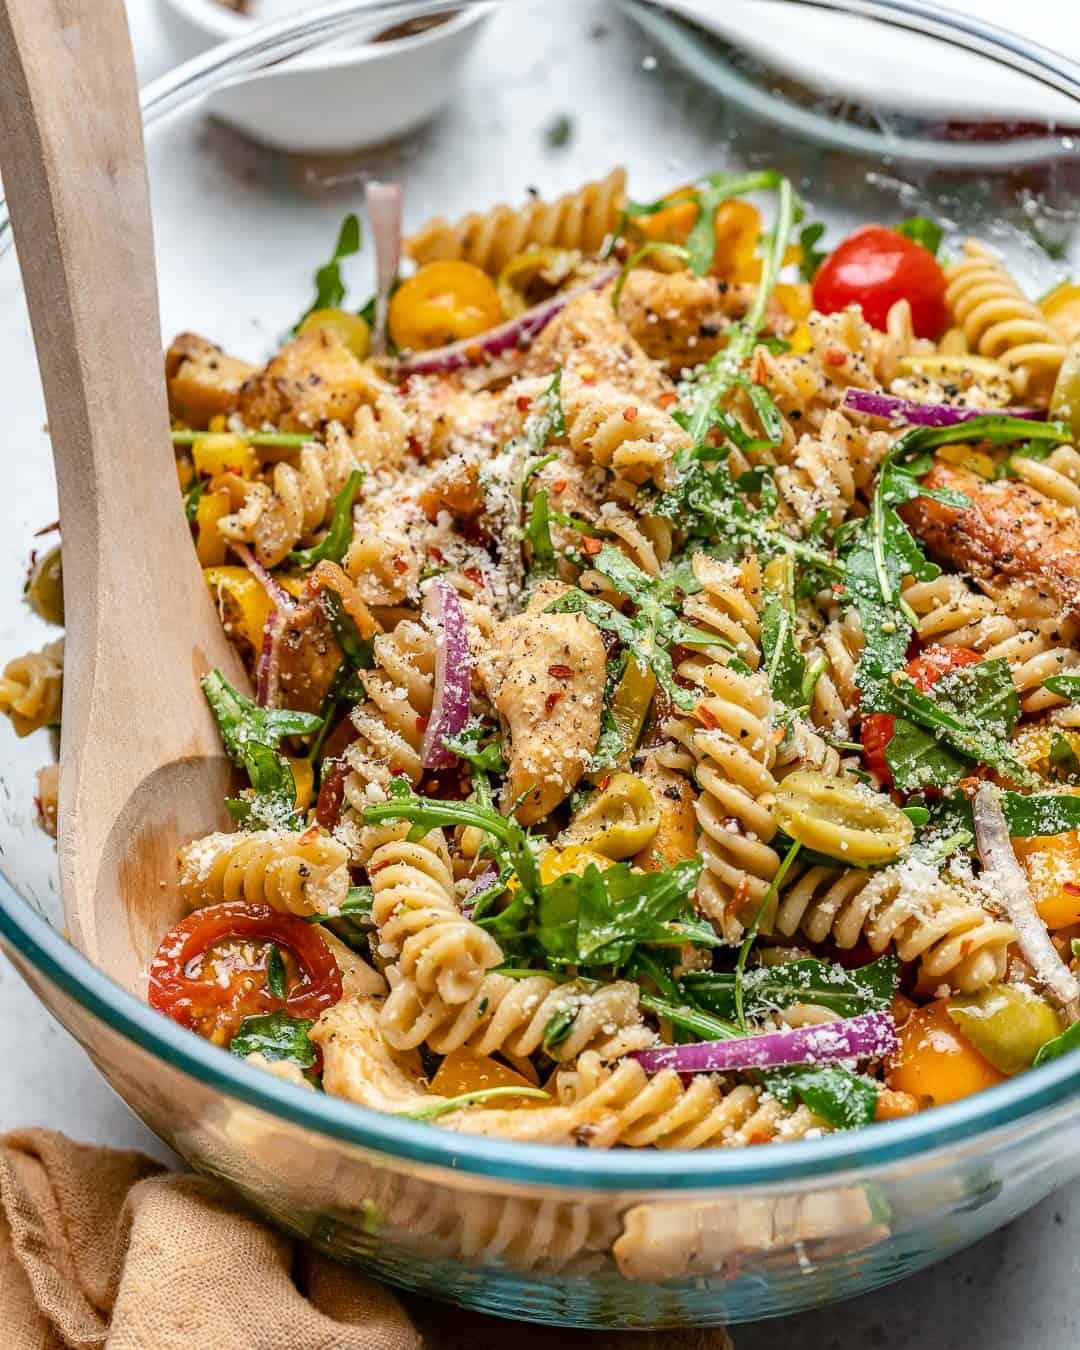 simple and healthy pasta salad recipe